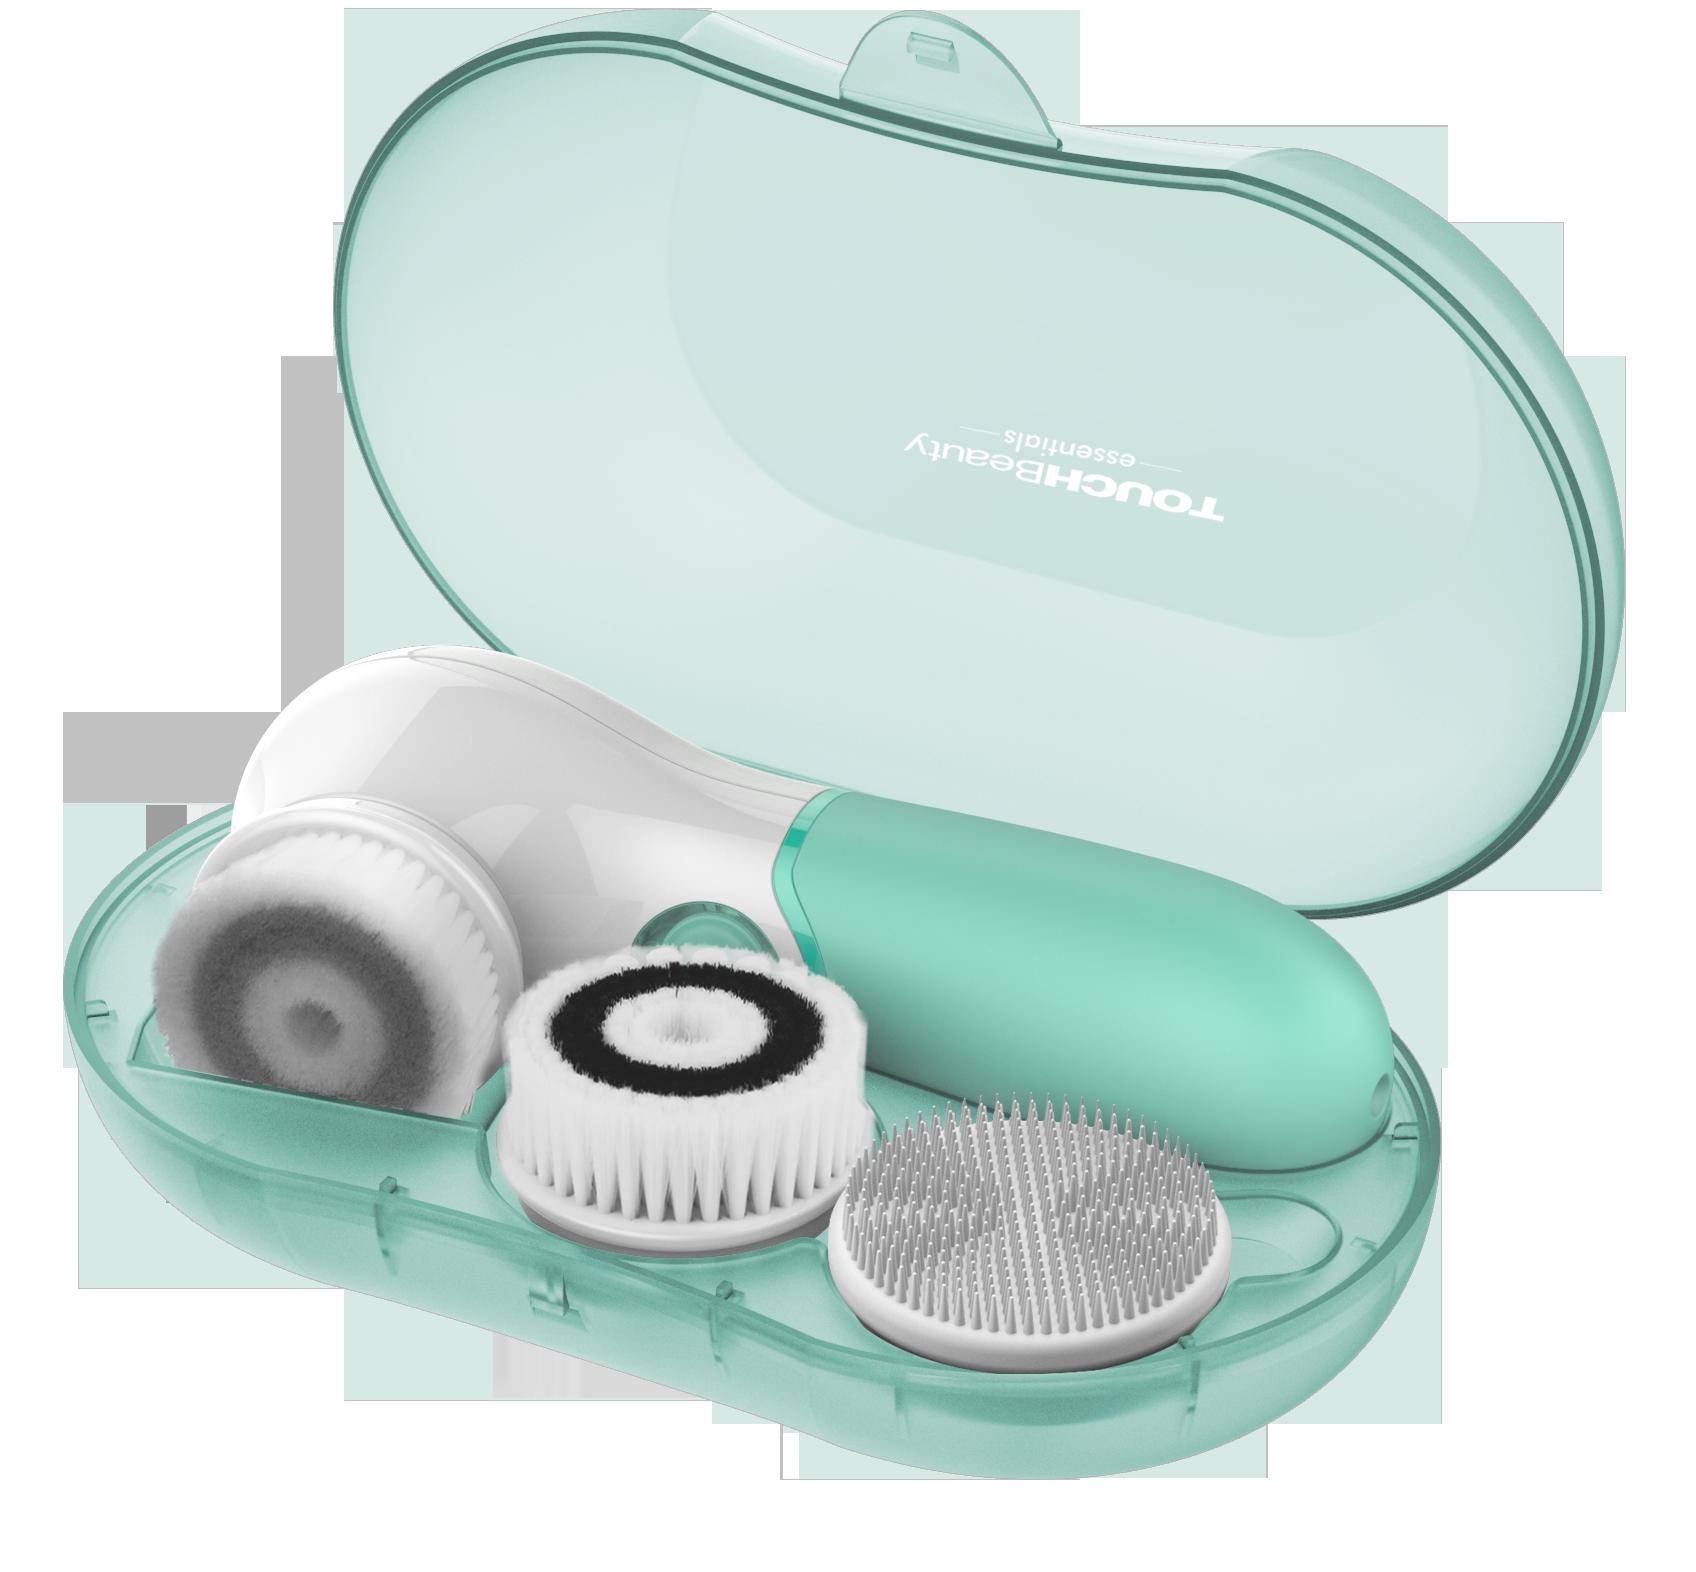 Electric Facial Cleanser SET Набор с электрическим аппаратом для очищения кожи лица TouchBeauty